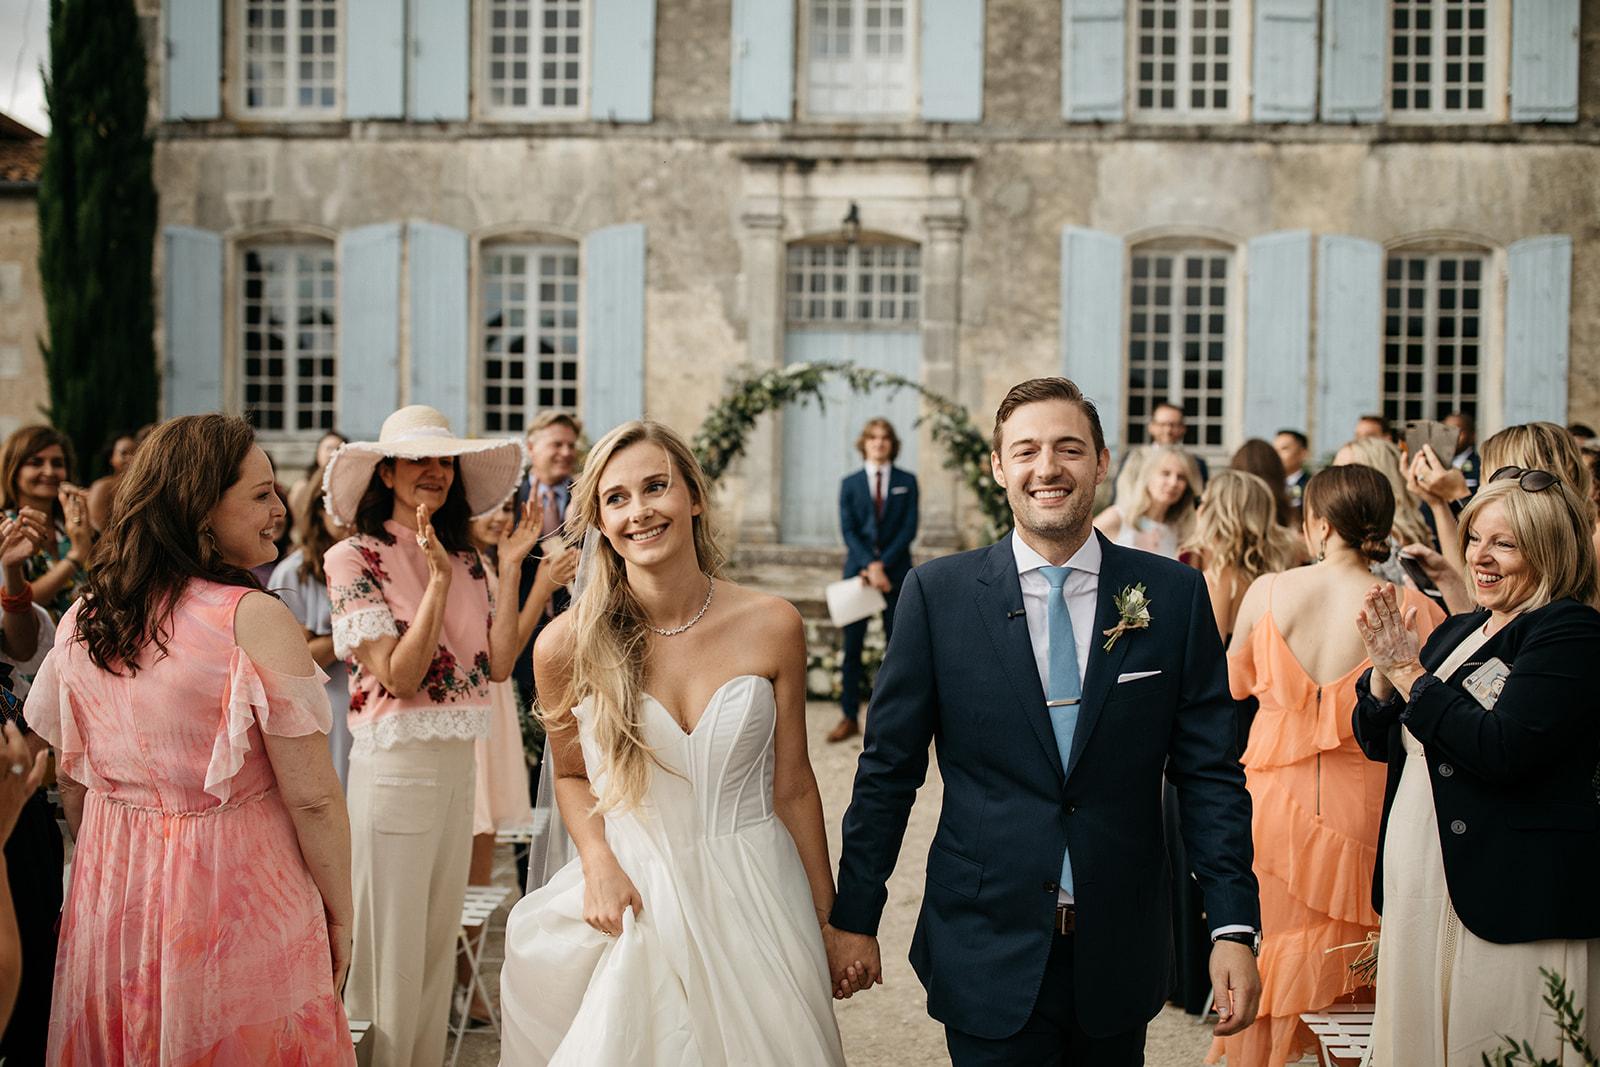 Madison & Joren - Jarnac, FranceVenue: Family Country HomePhotographer: LifeStoriesGuest Count: 115Vibe: Romantic